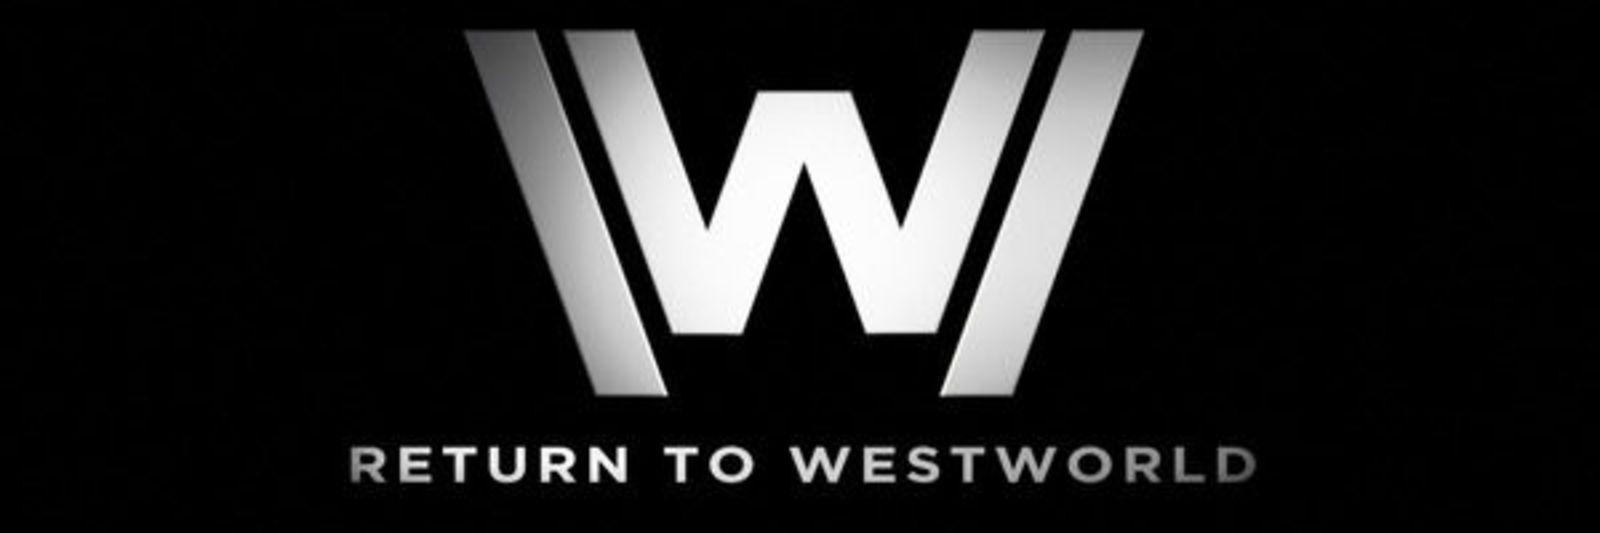 Return to Westworld